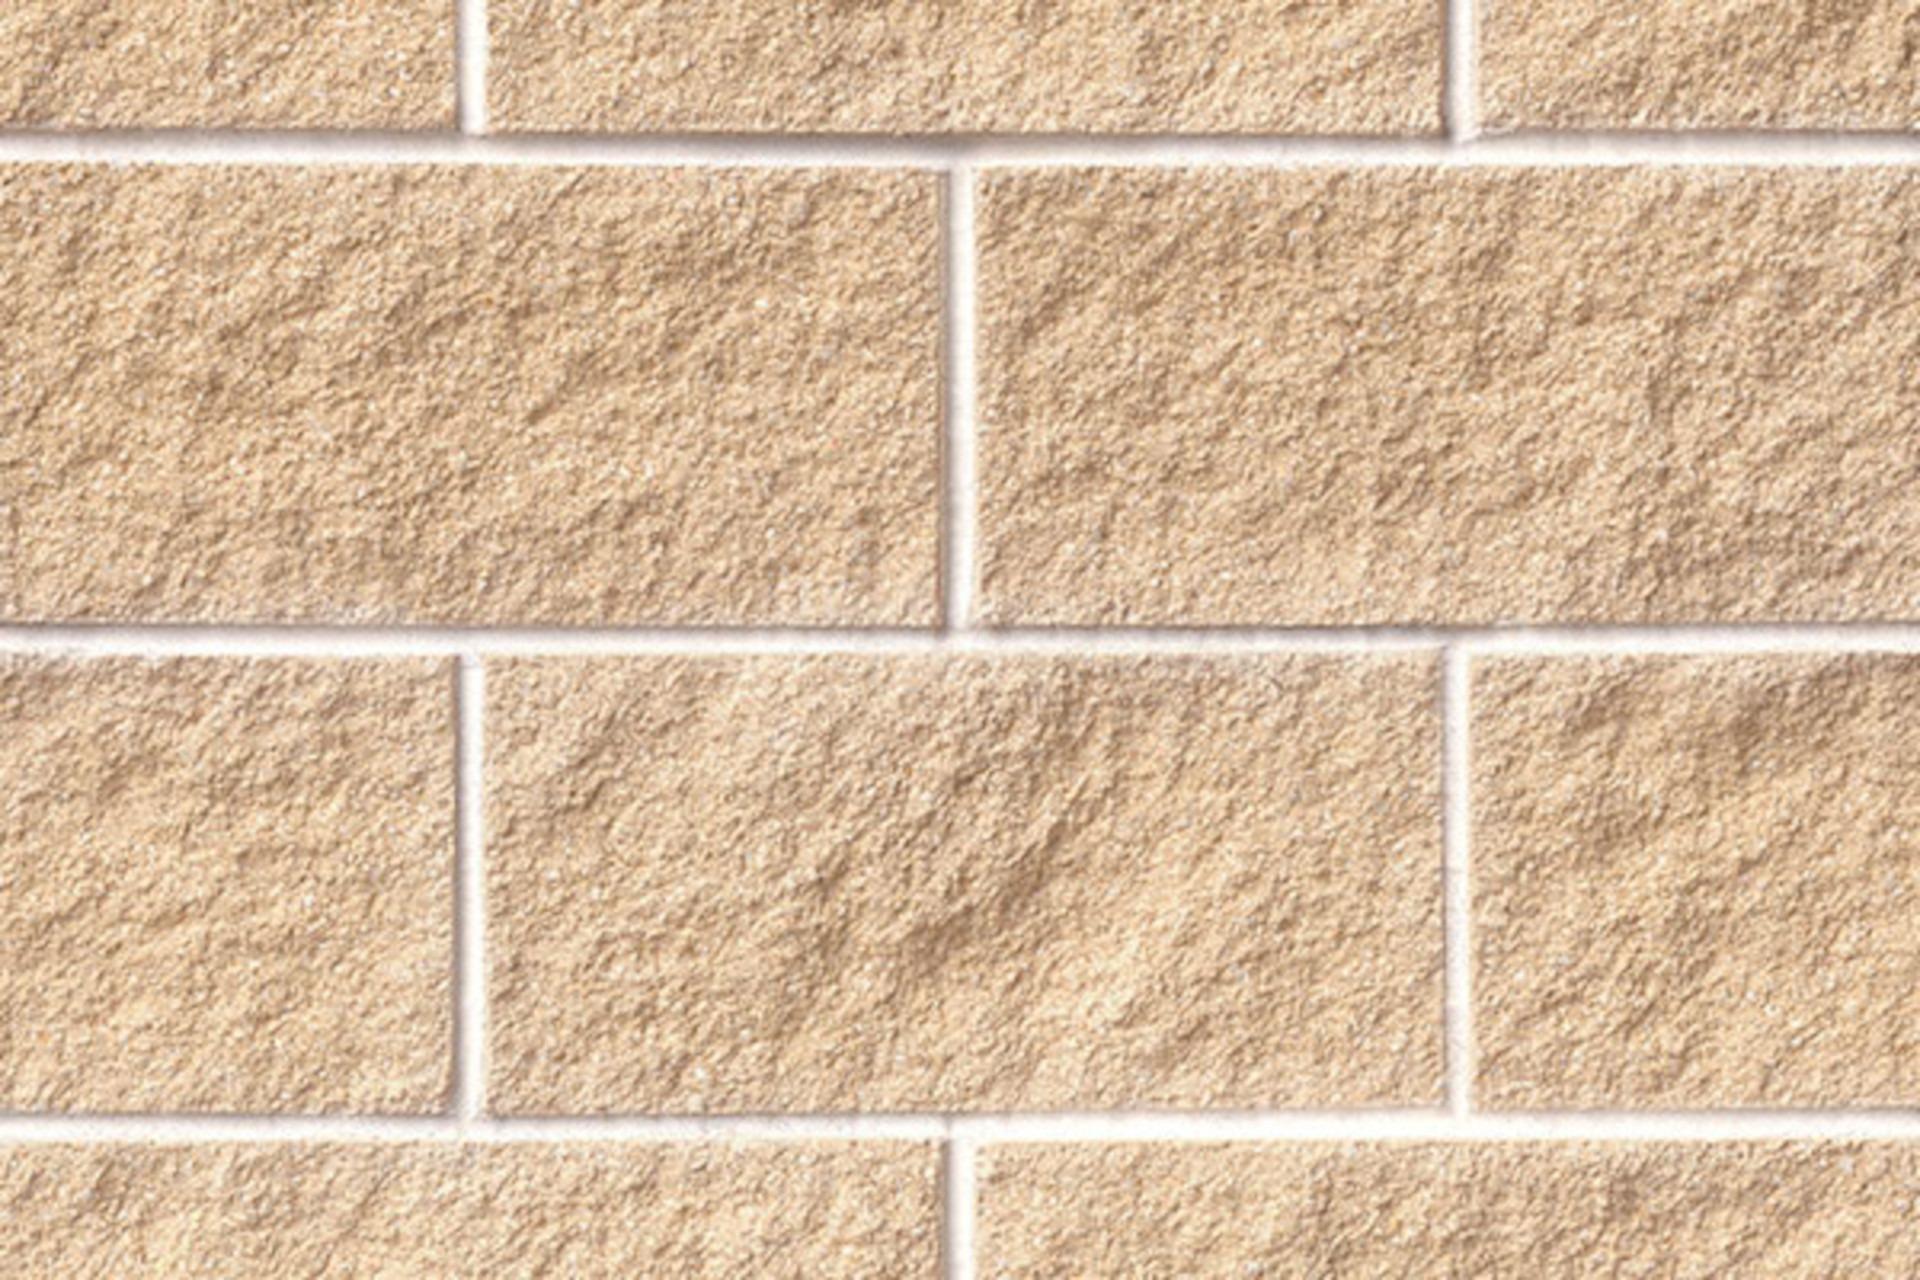 260 Western Gold Concrete Block